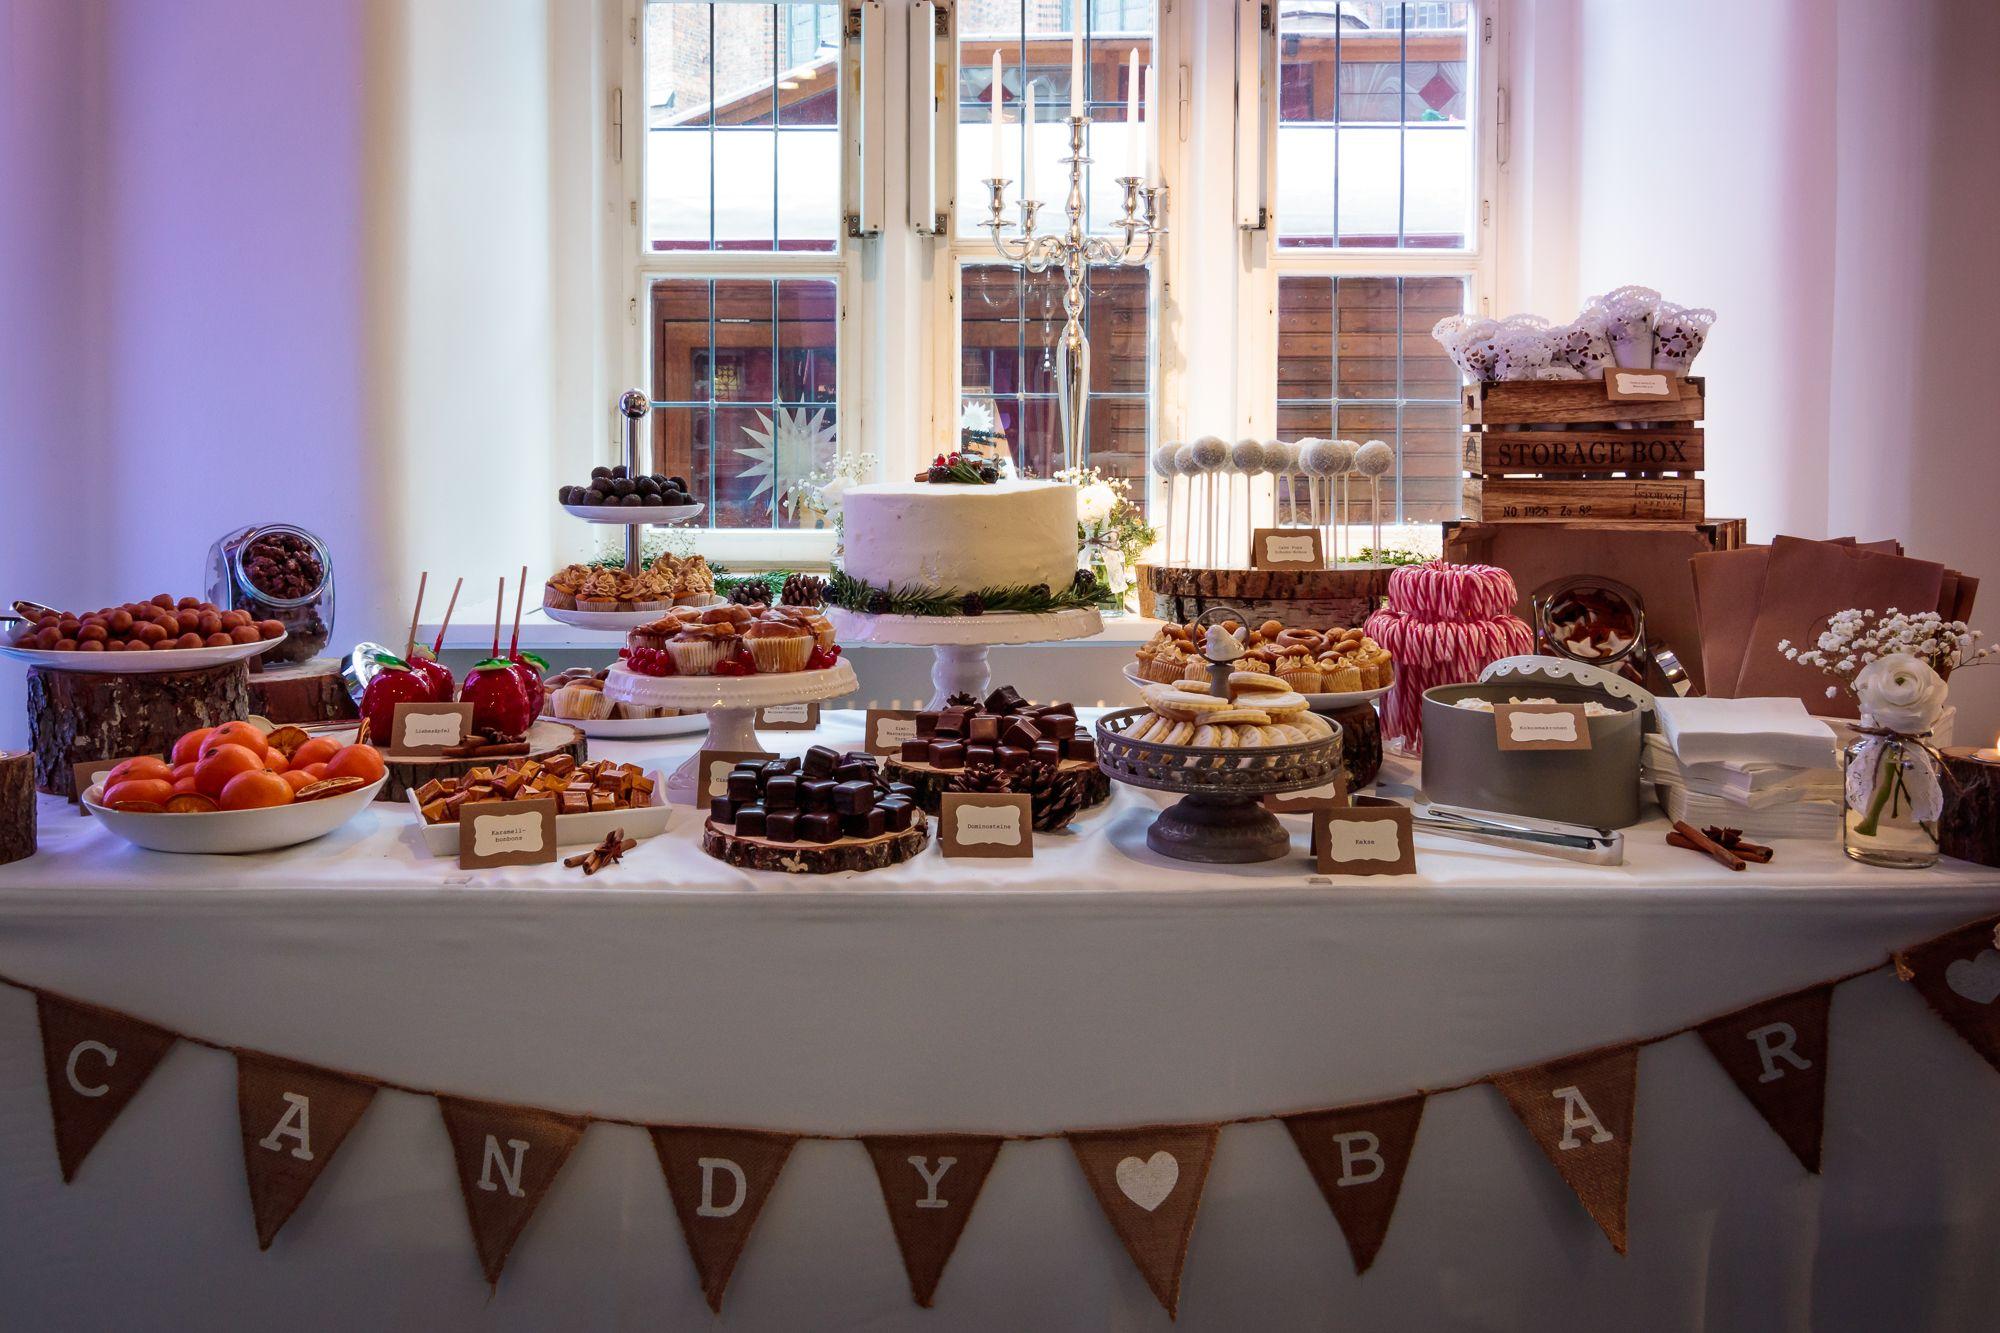 winter wedding candy bar, white cake pops, wedding cookies, winter wedding cake, cupcakes, mini-cupcakes, cinnamon rolls, sweet table